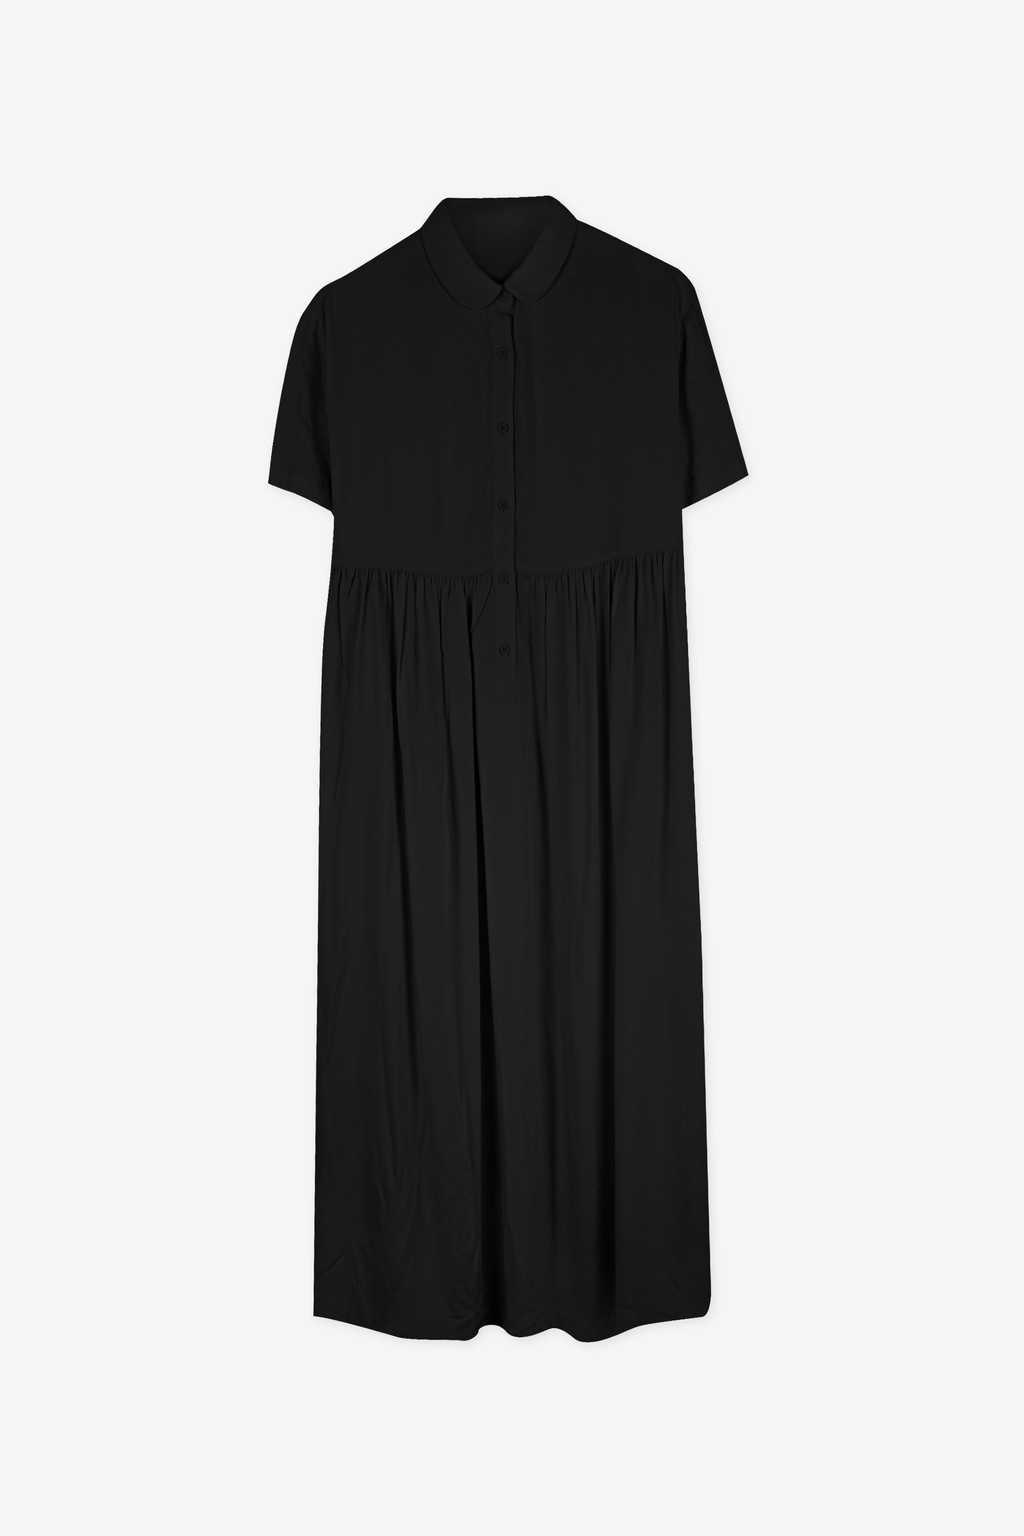 Dress 1166 Black 5